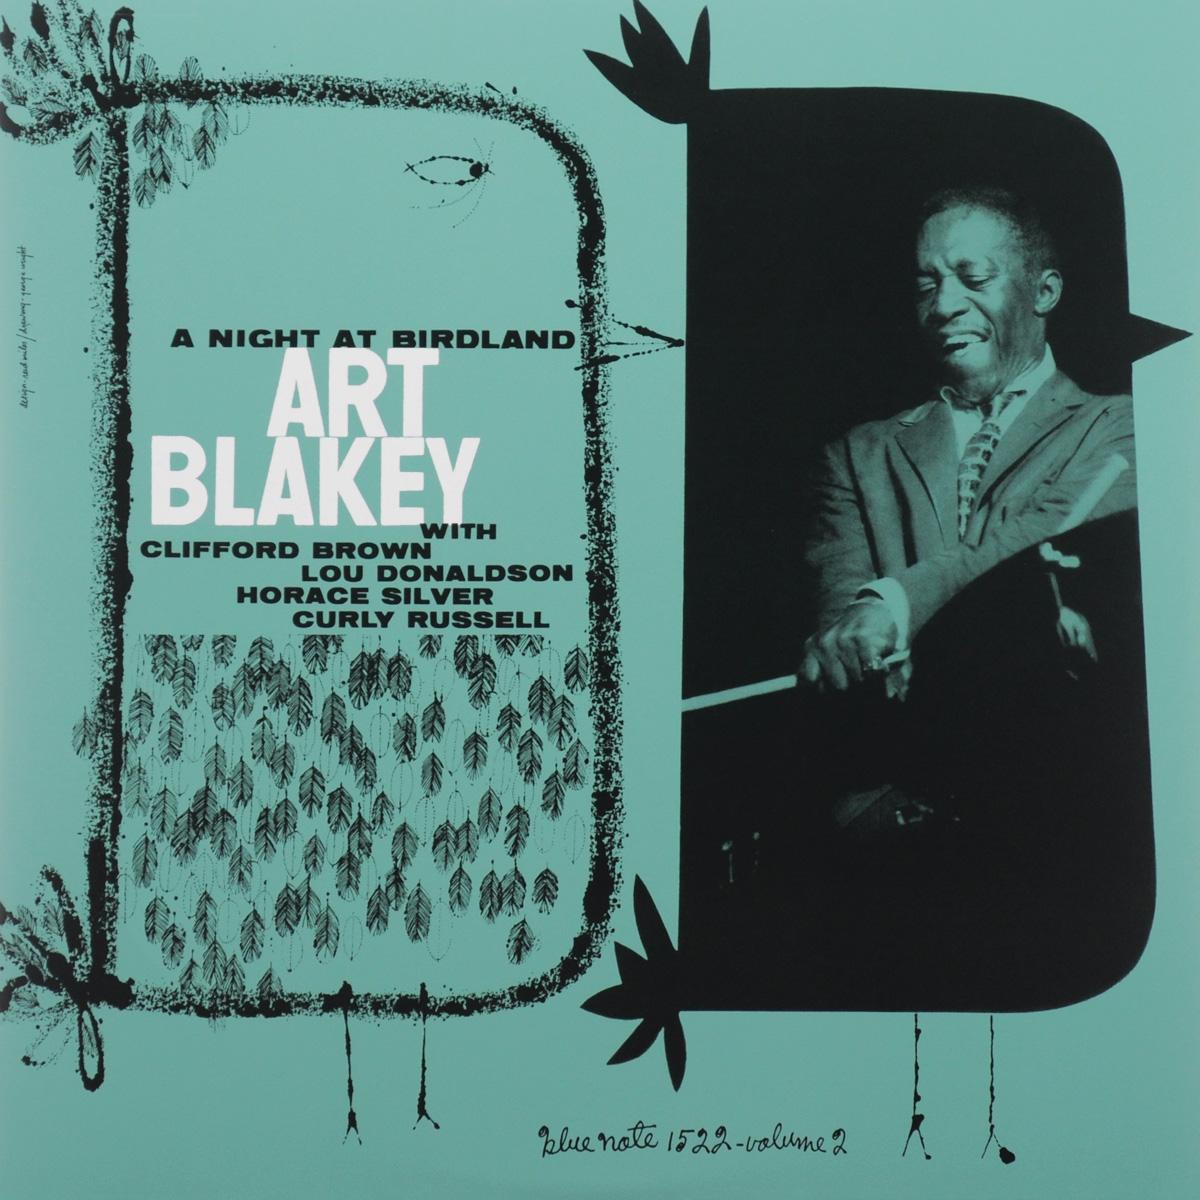 Art Blakey Quintet Art Blakey Quintet. A Night At Birdland. Volume 2 (LP) art blakey quintet art blakey quintet a night at birdland volume 2 lp